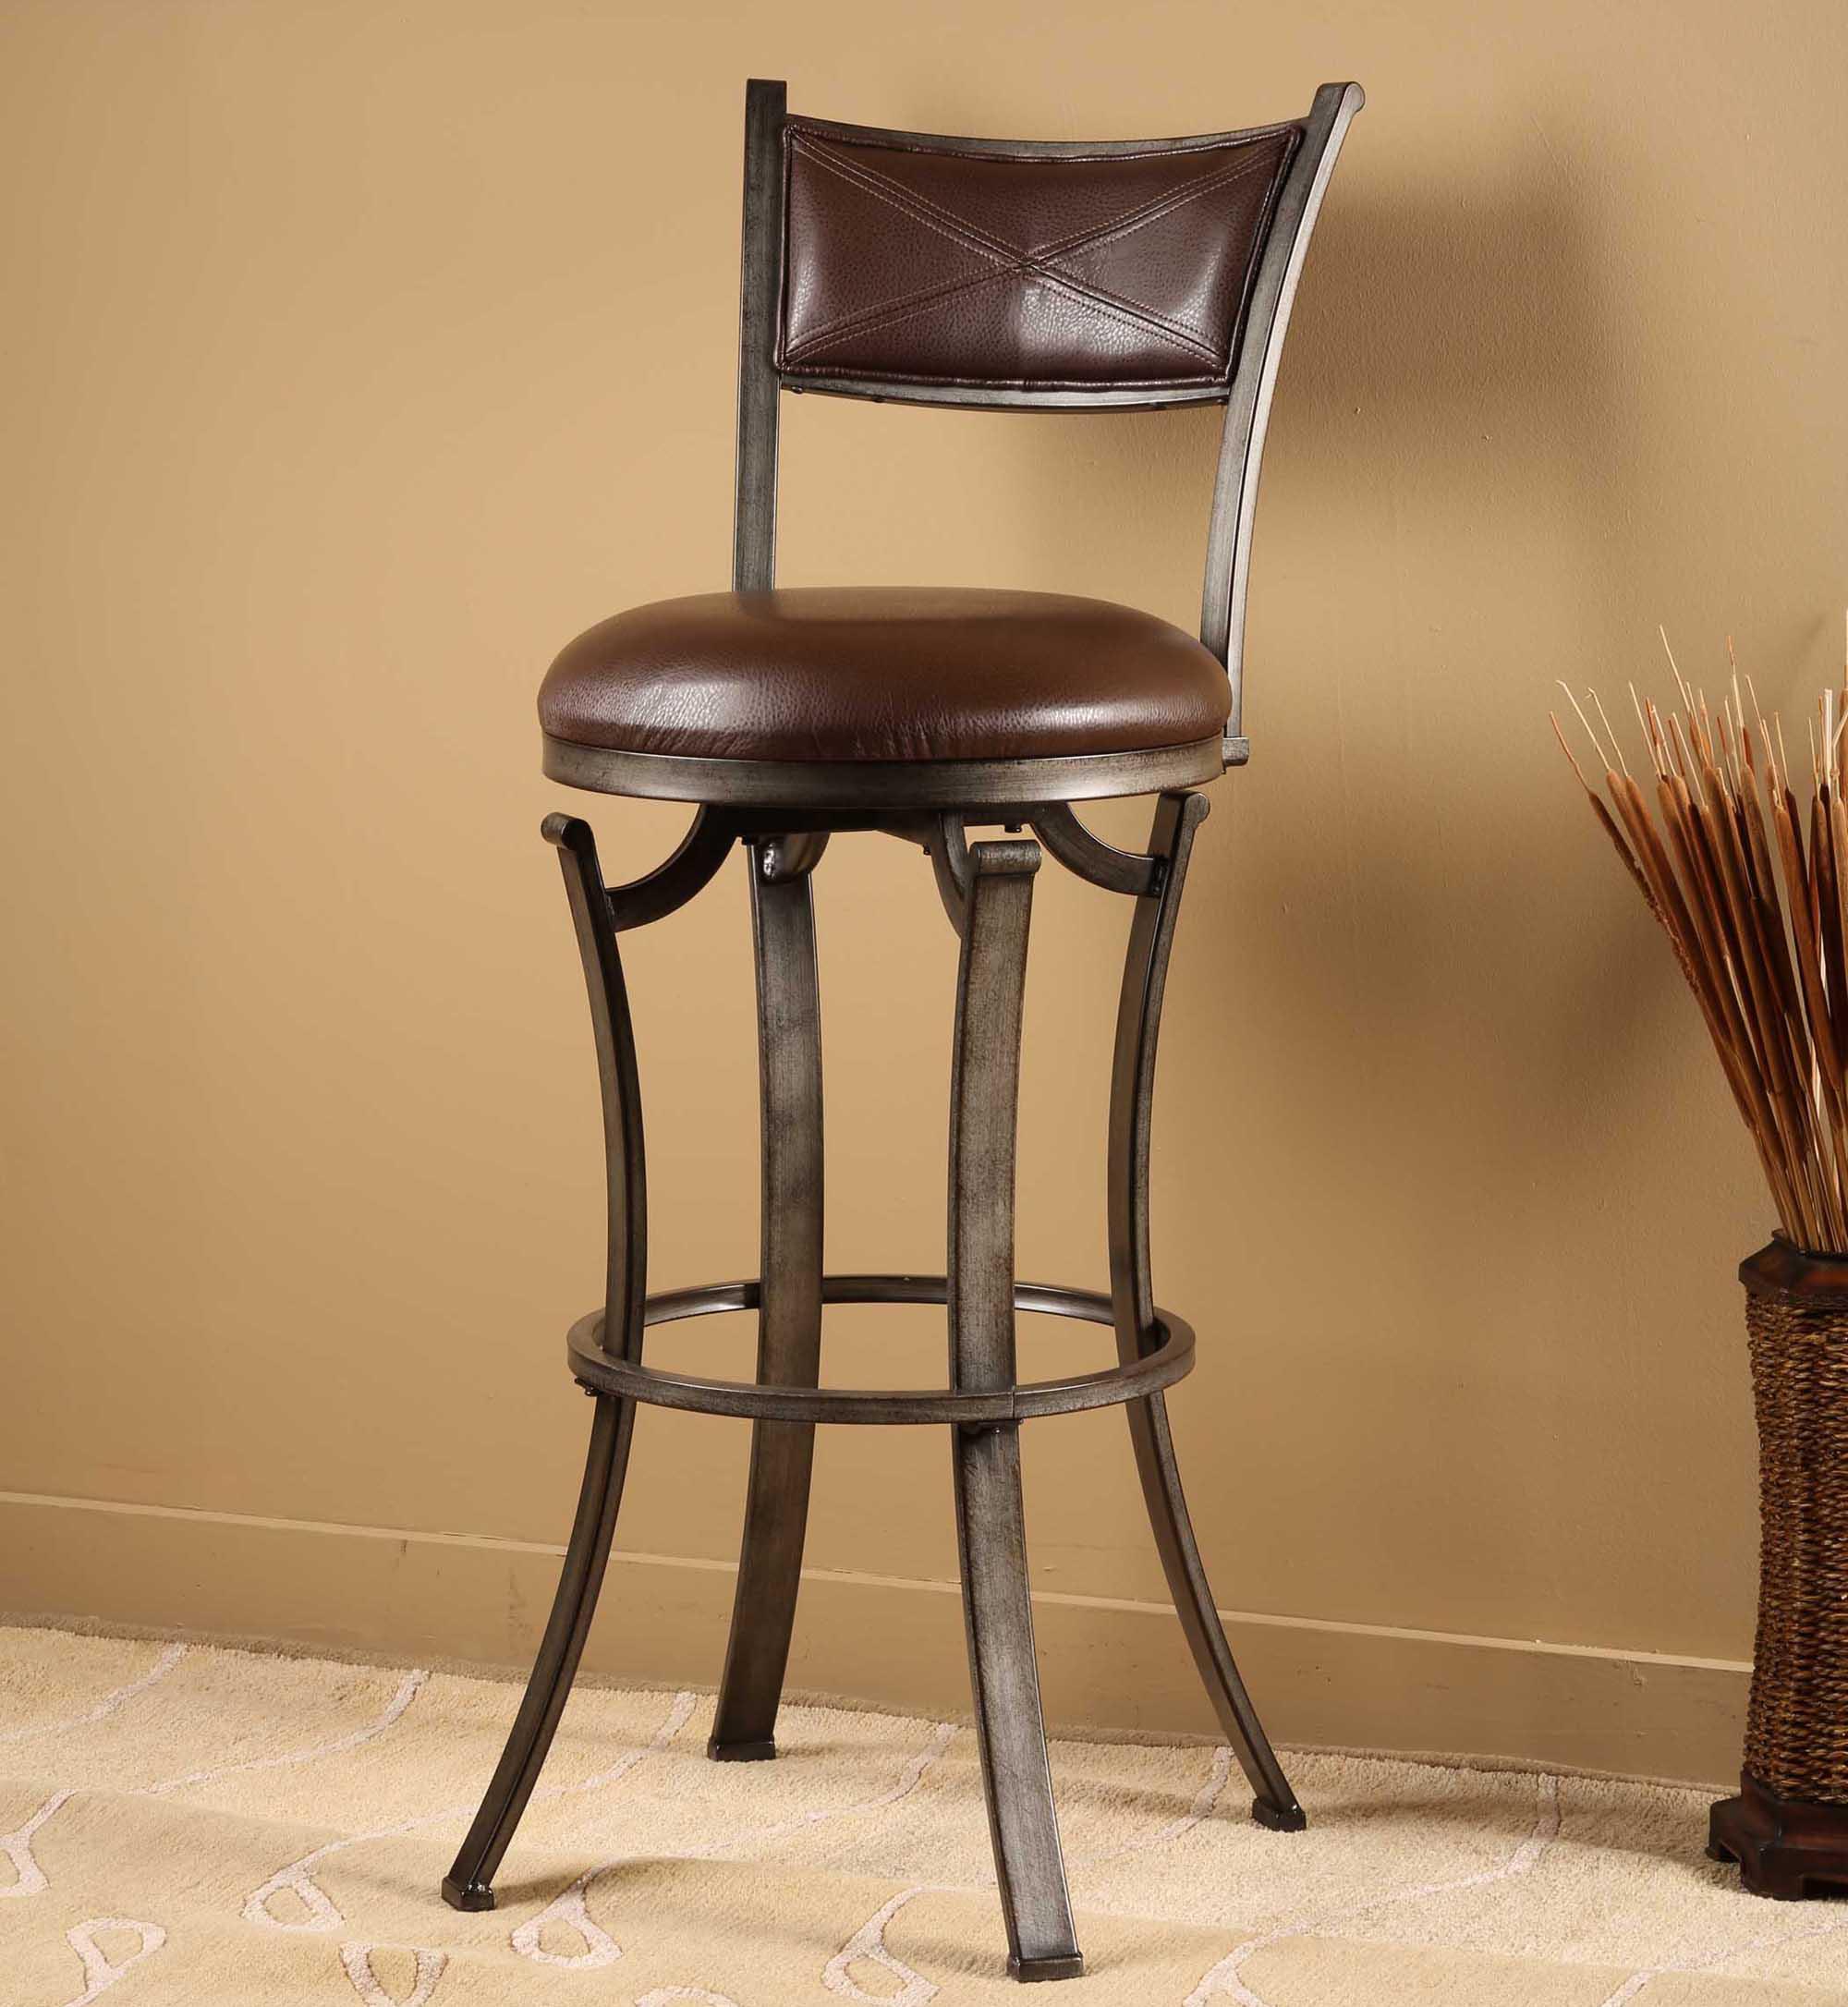 Hillsdale Stools Drummond Swivel Bar Stool Prime Brothers Furniture Bar Stools